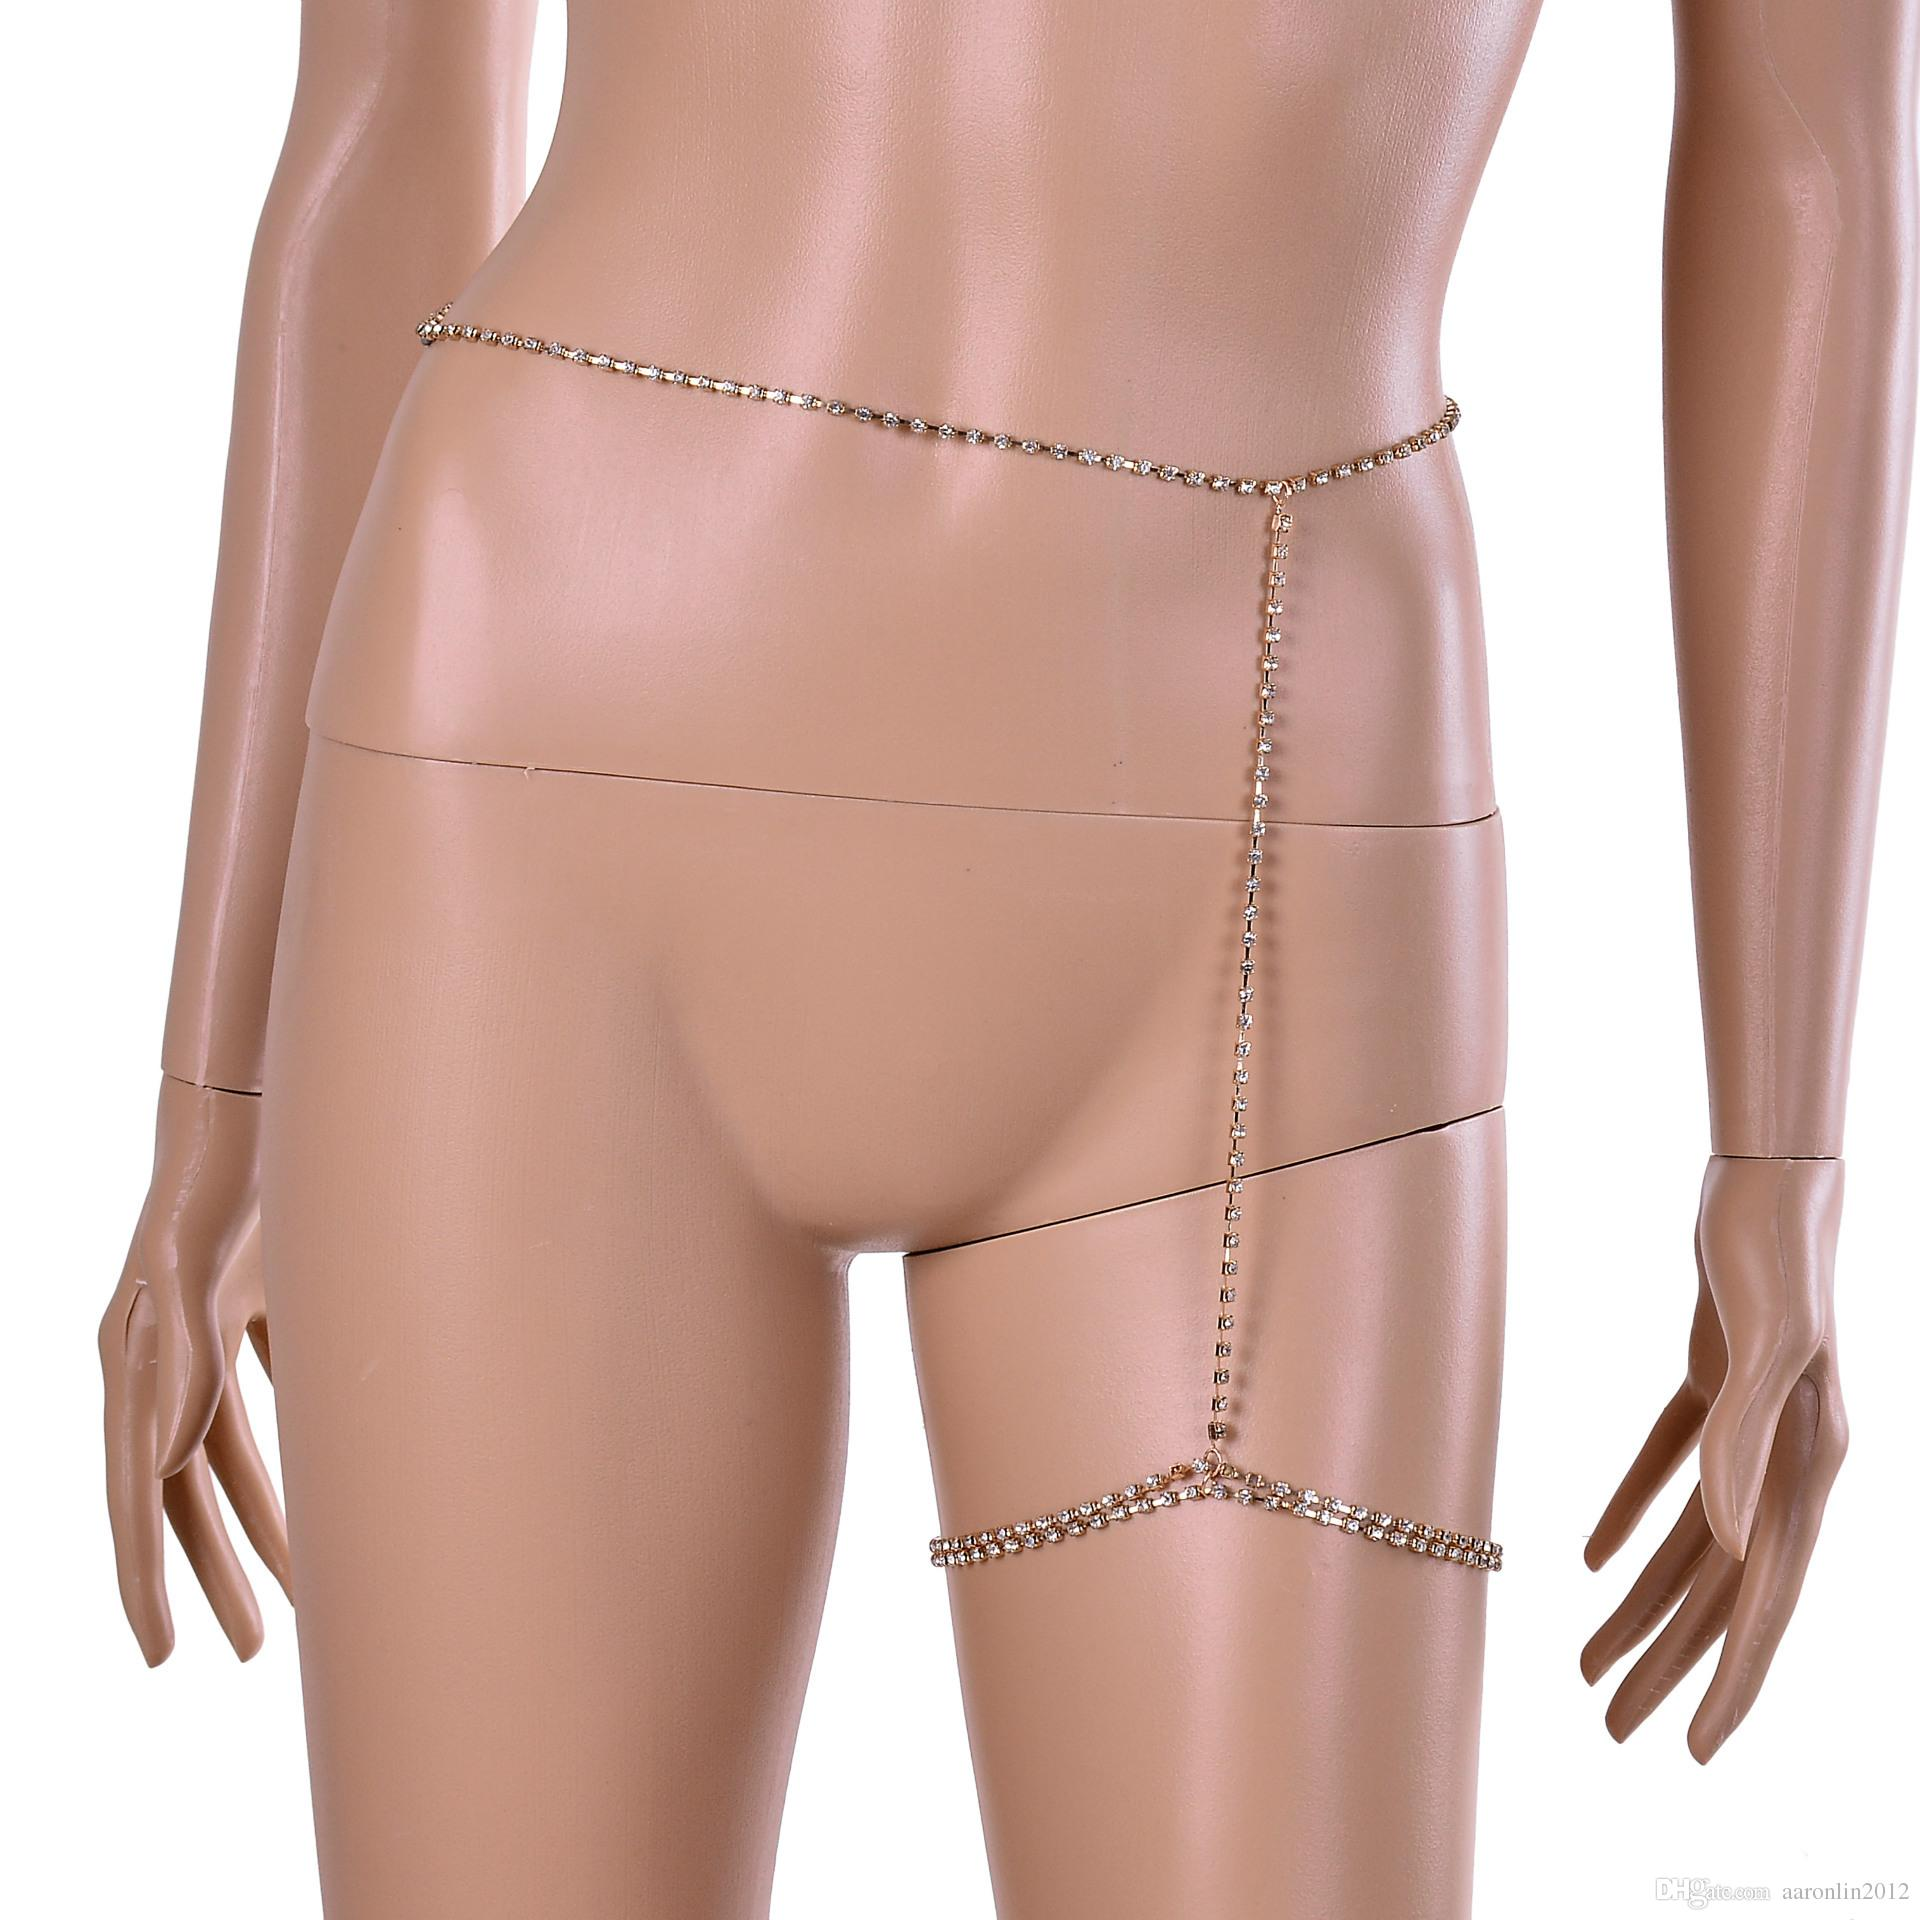 Modemarke Kristall bein Kette Körperschmuck Sexy Frauen Strass Fußkettchen Bauch Ketten Geometrische Club Nacht Rock Körperkette 2017